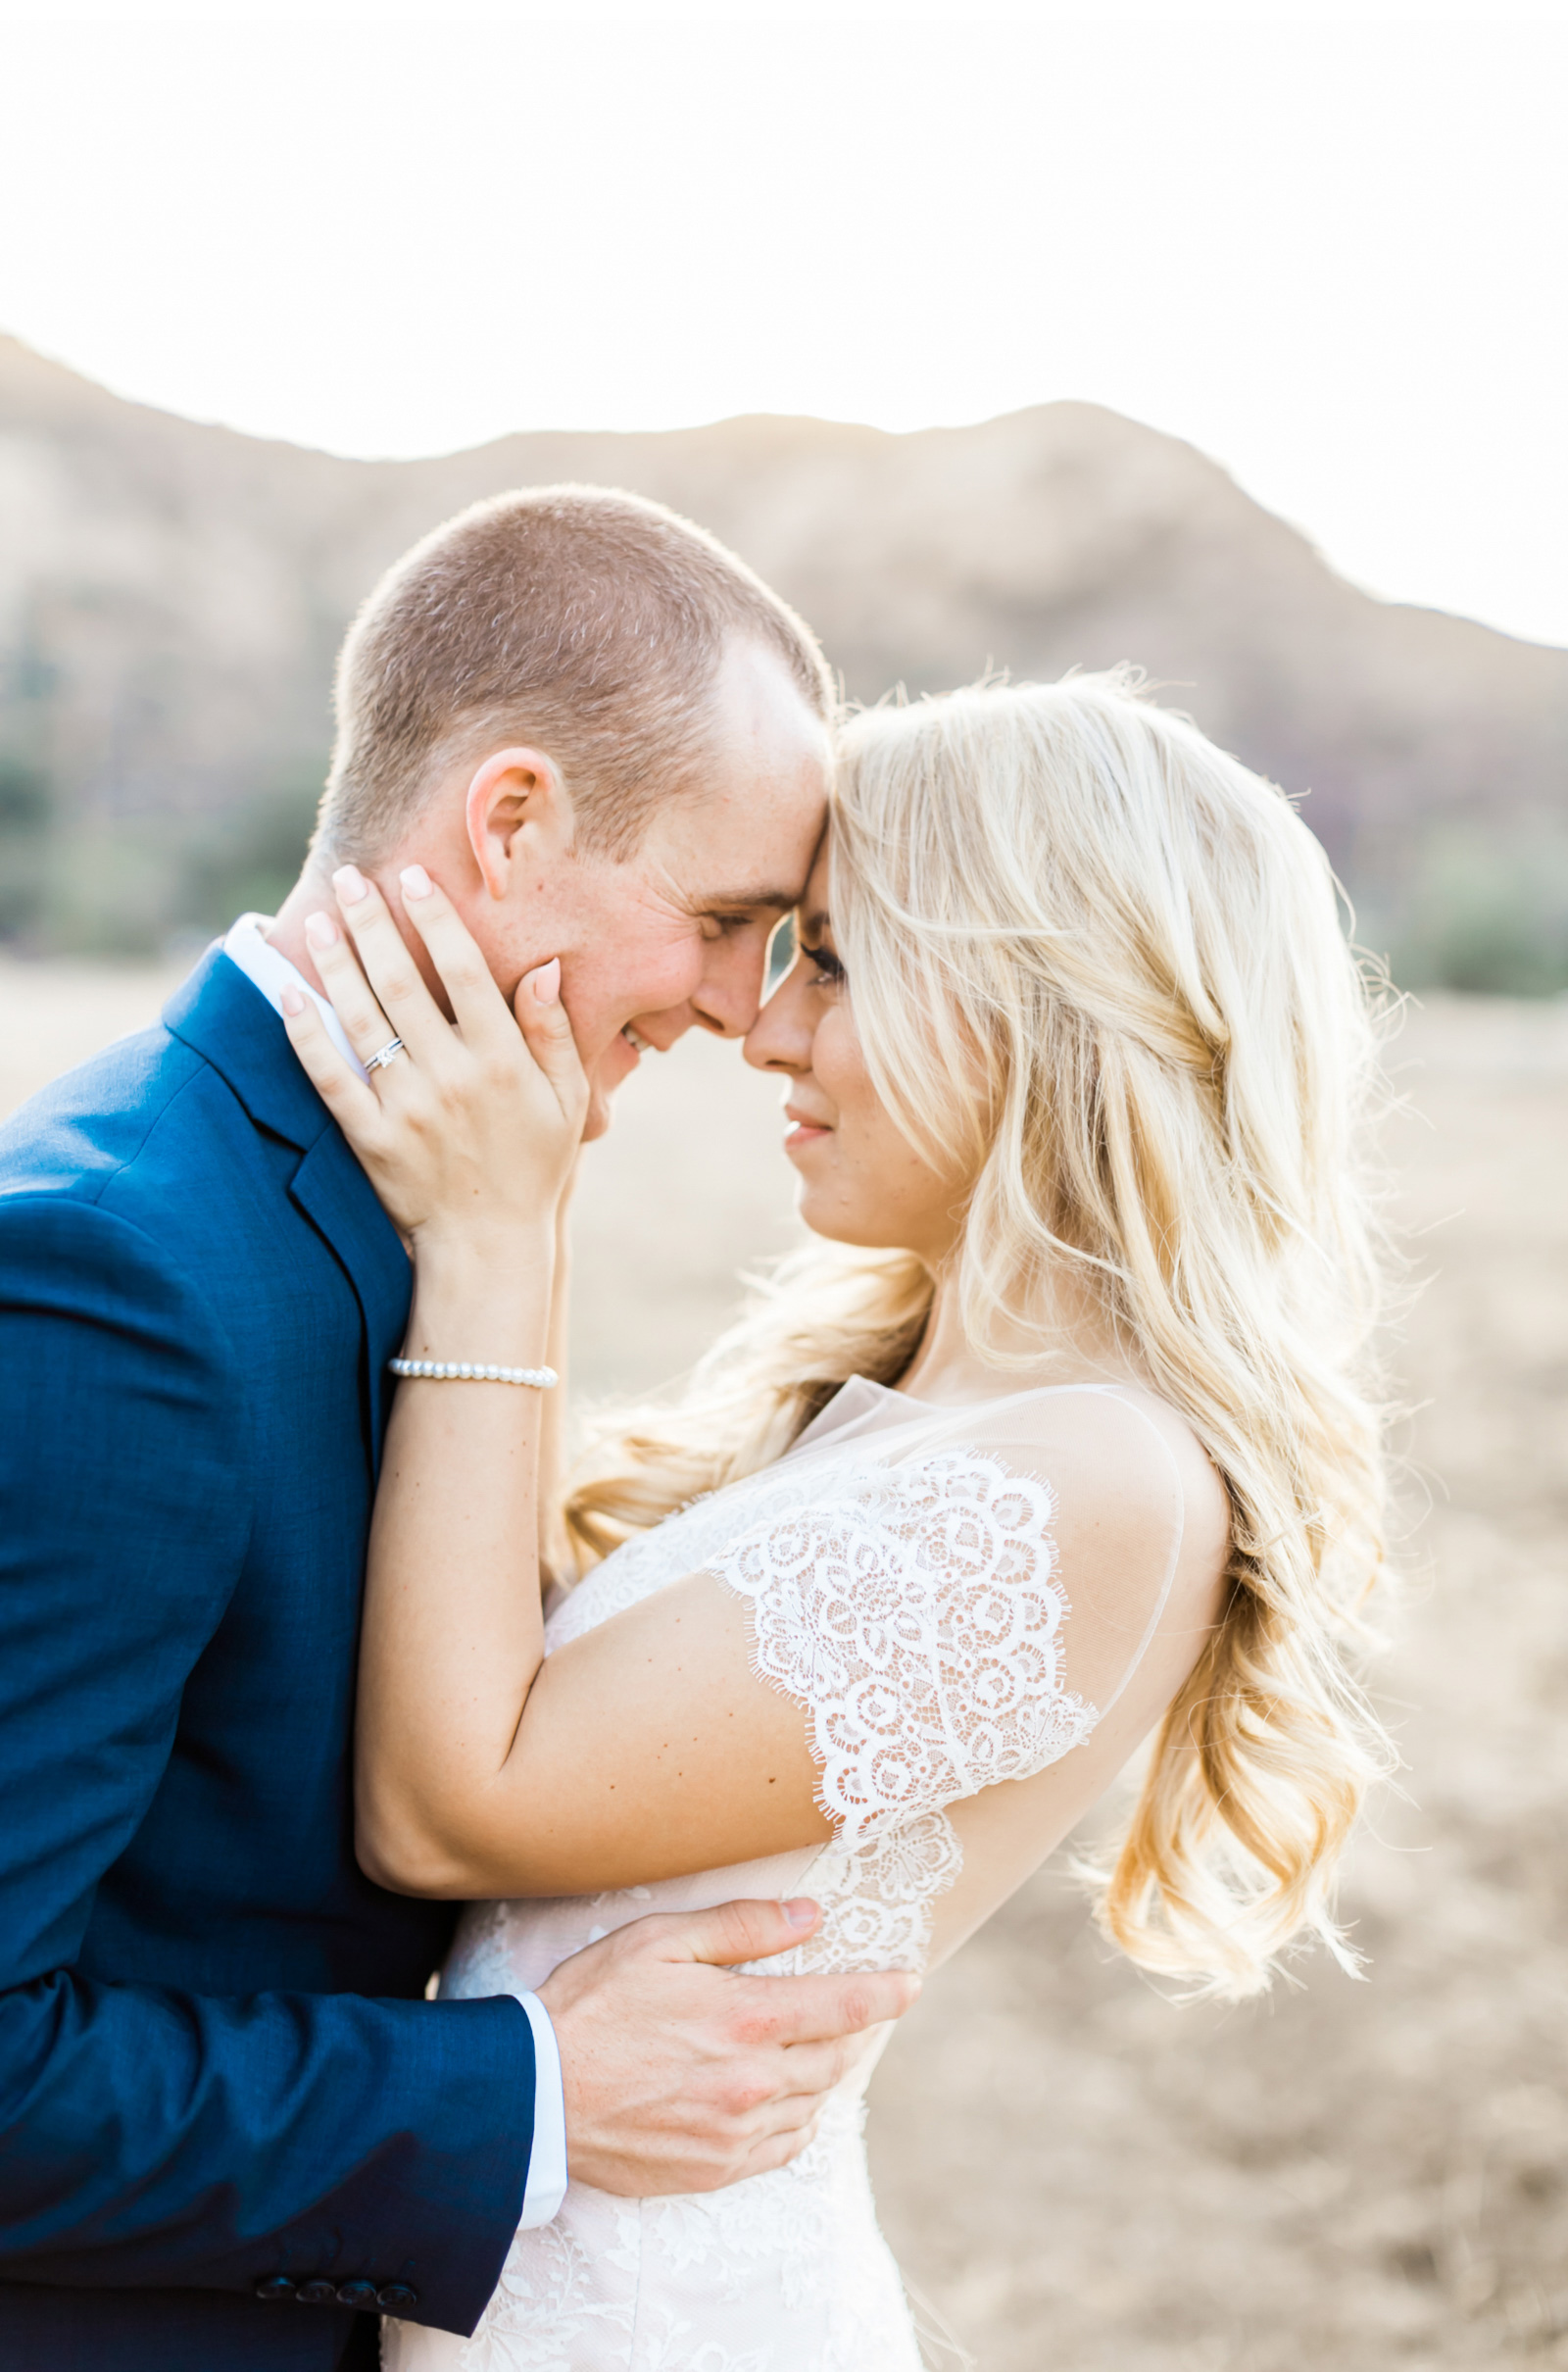 California-Wedding-Photographer-Style-Me-Pretty-Natalie-Schutt-San-Luis-Obispo_04.jpg